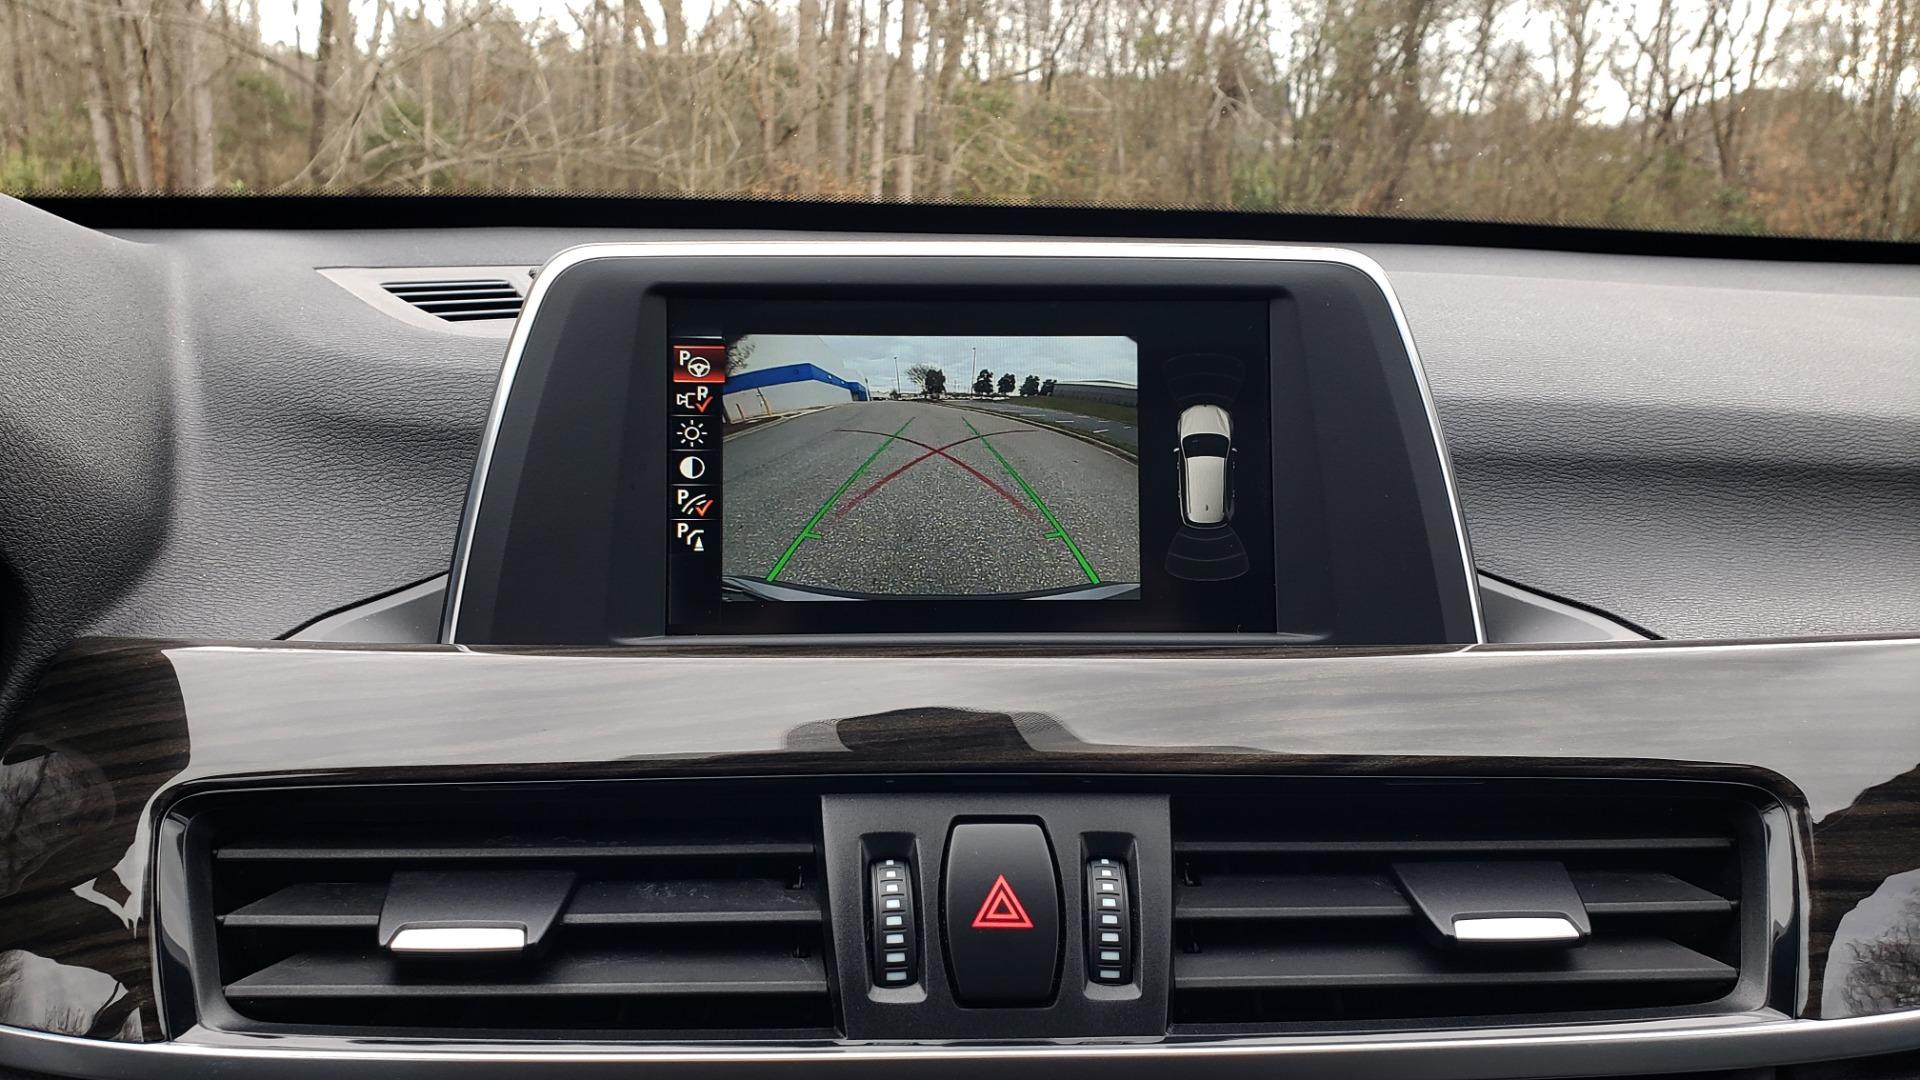 Used 2017 BMW X1 XDRIVE28I / PREM PKG / DRIVER ASST / NAV / CLD WTHR for sale Sold at Formula Imports in Charlotte NC 28227 47